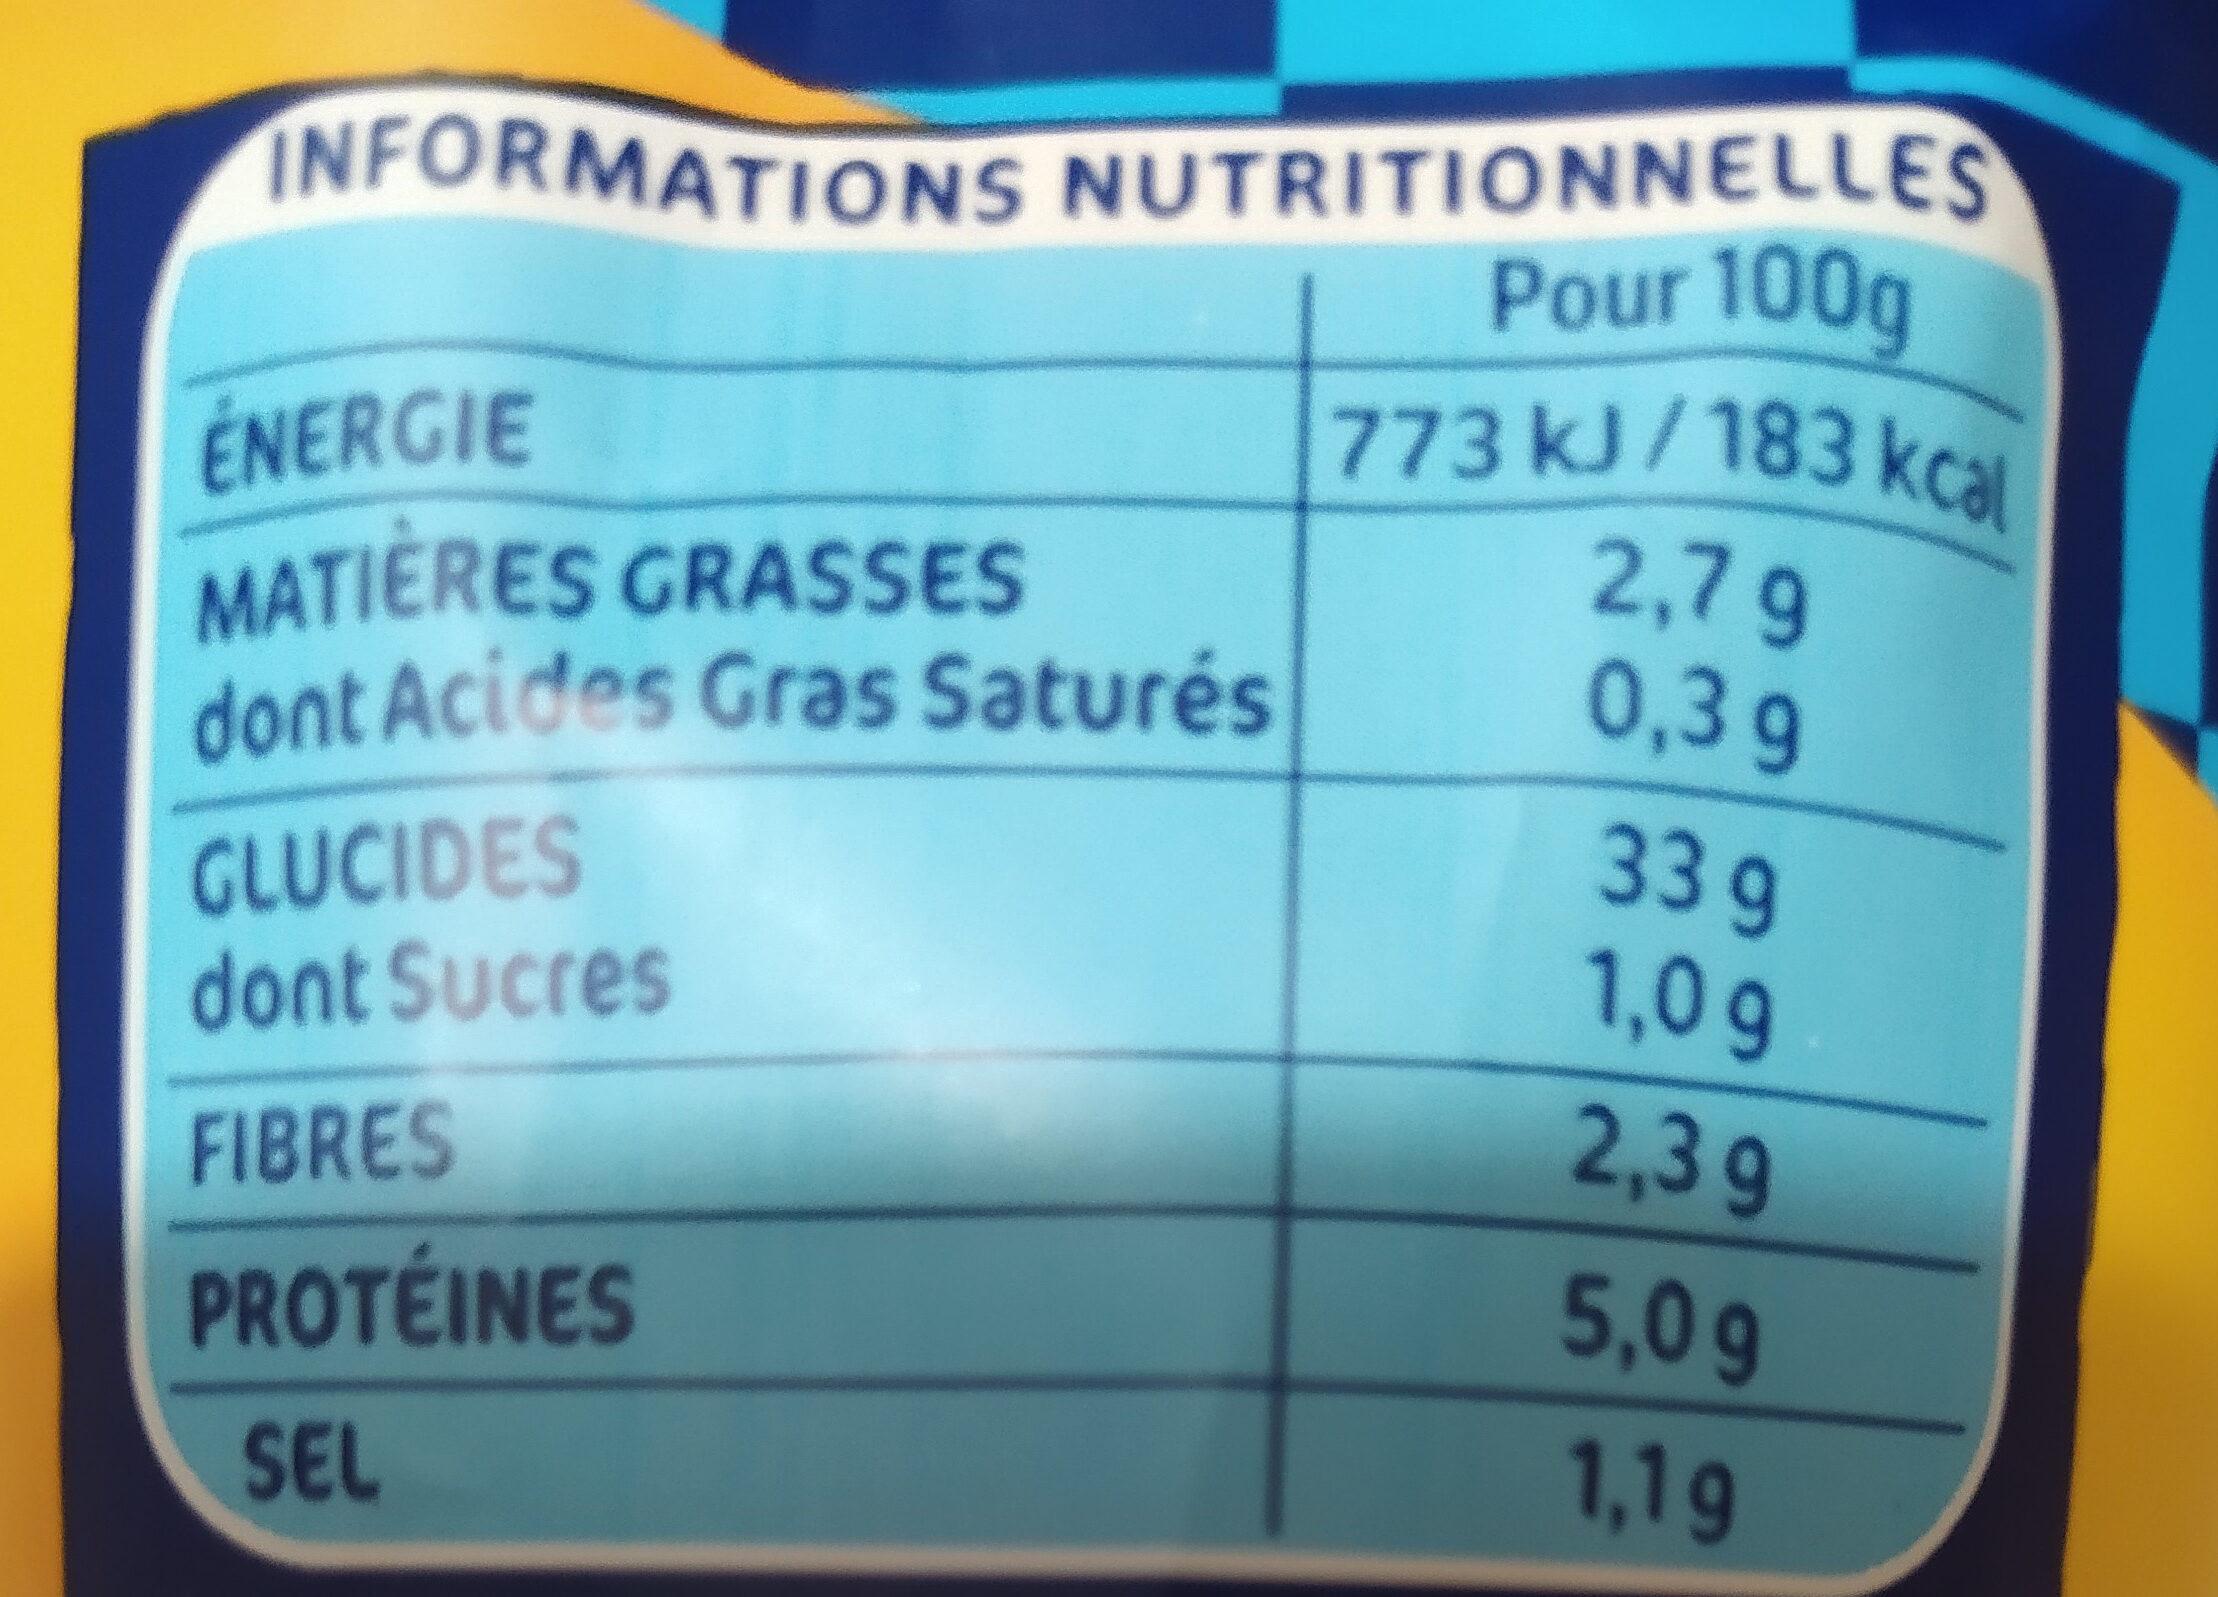 Lustucru gnocchi a poeler - Nutrition facts - fr